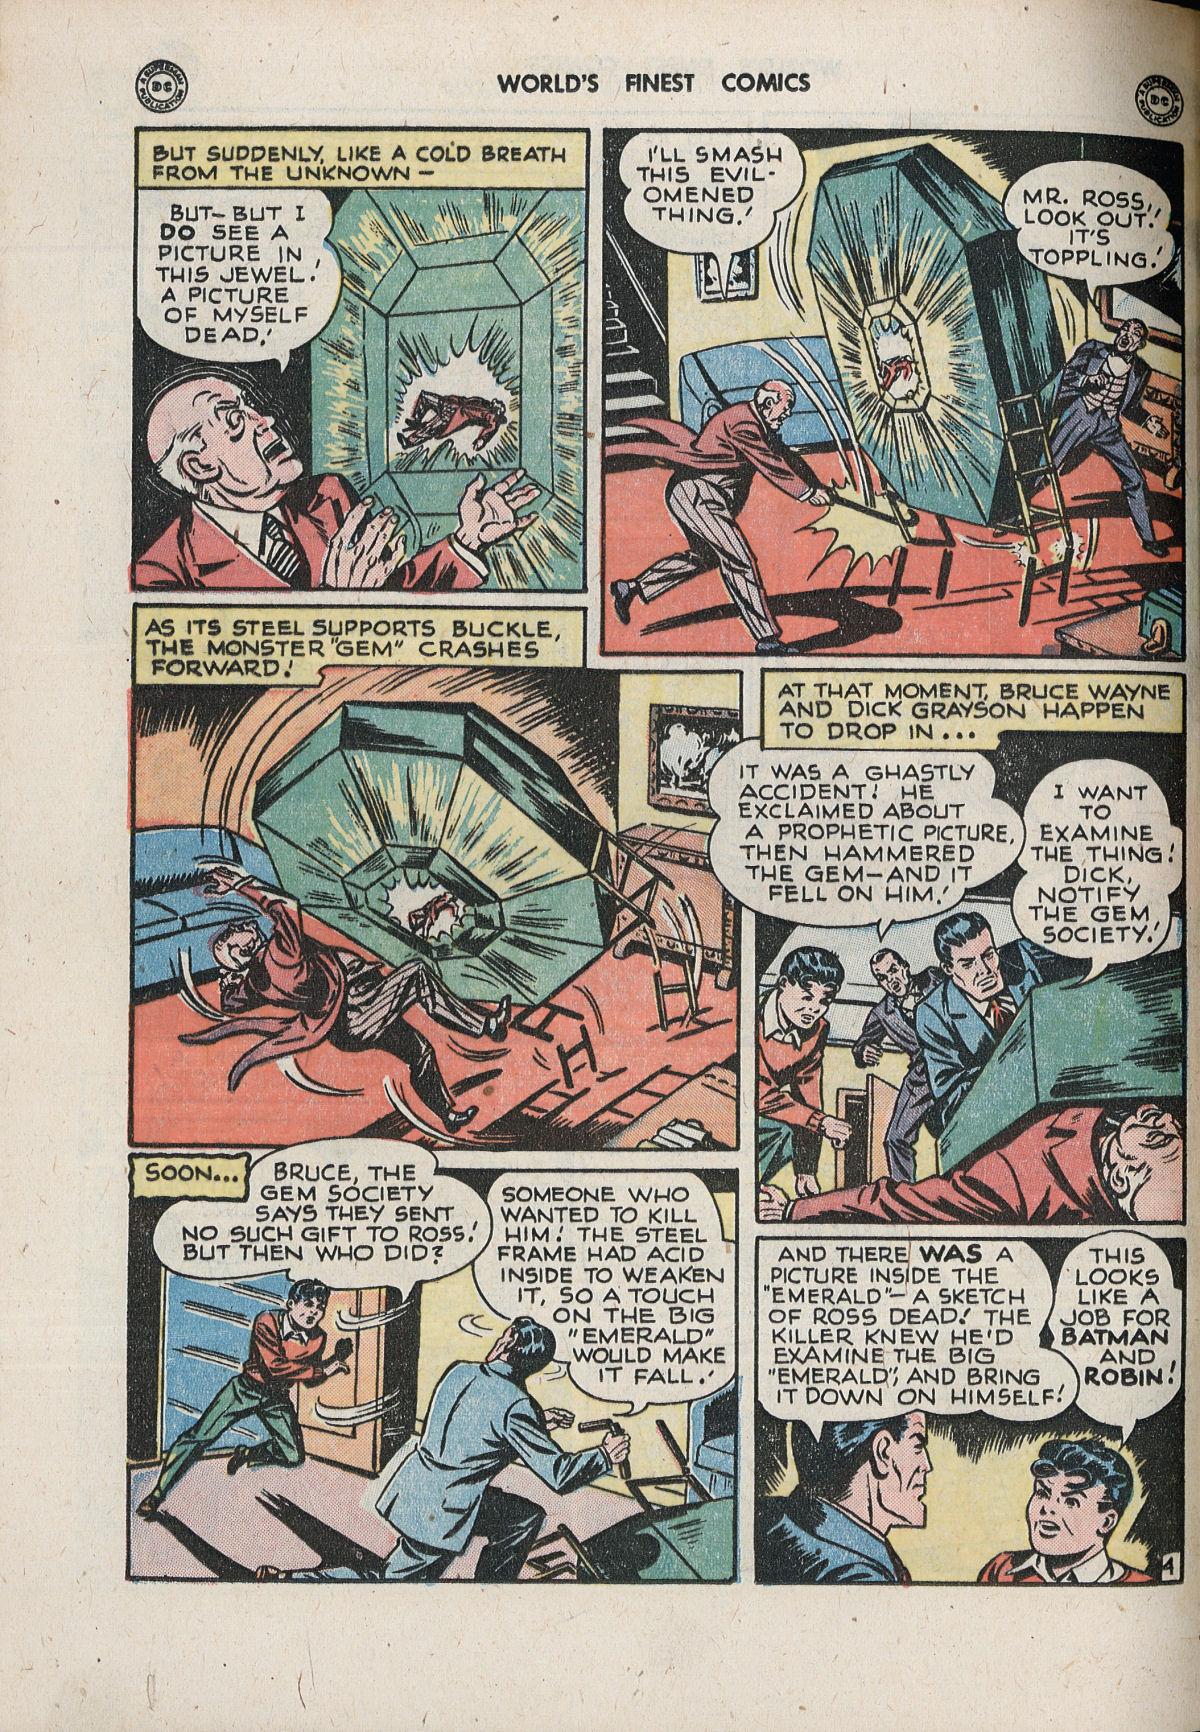 Read online World's Finest Comics comic -  Issue #33 - 64